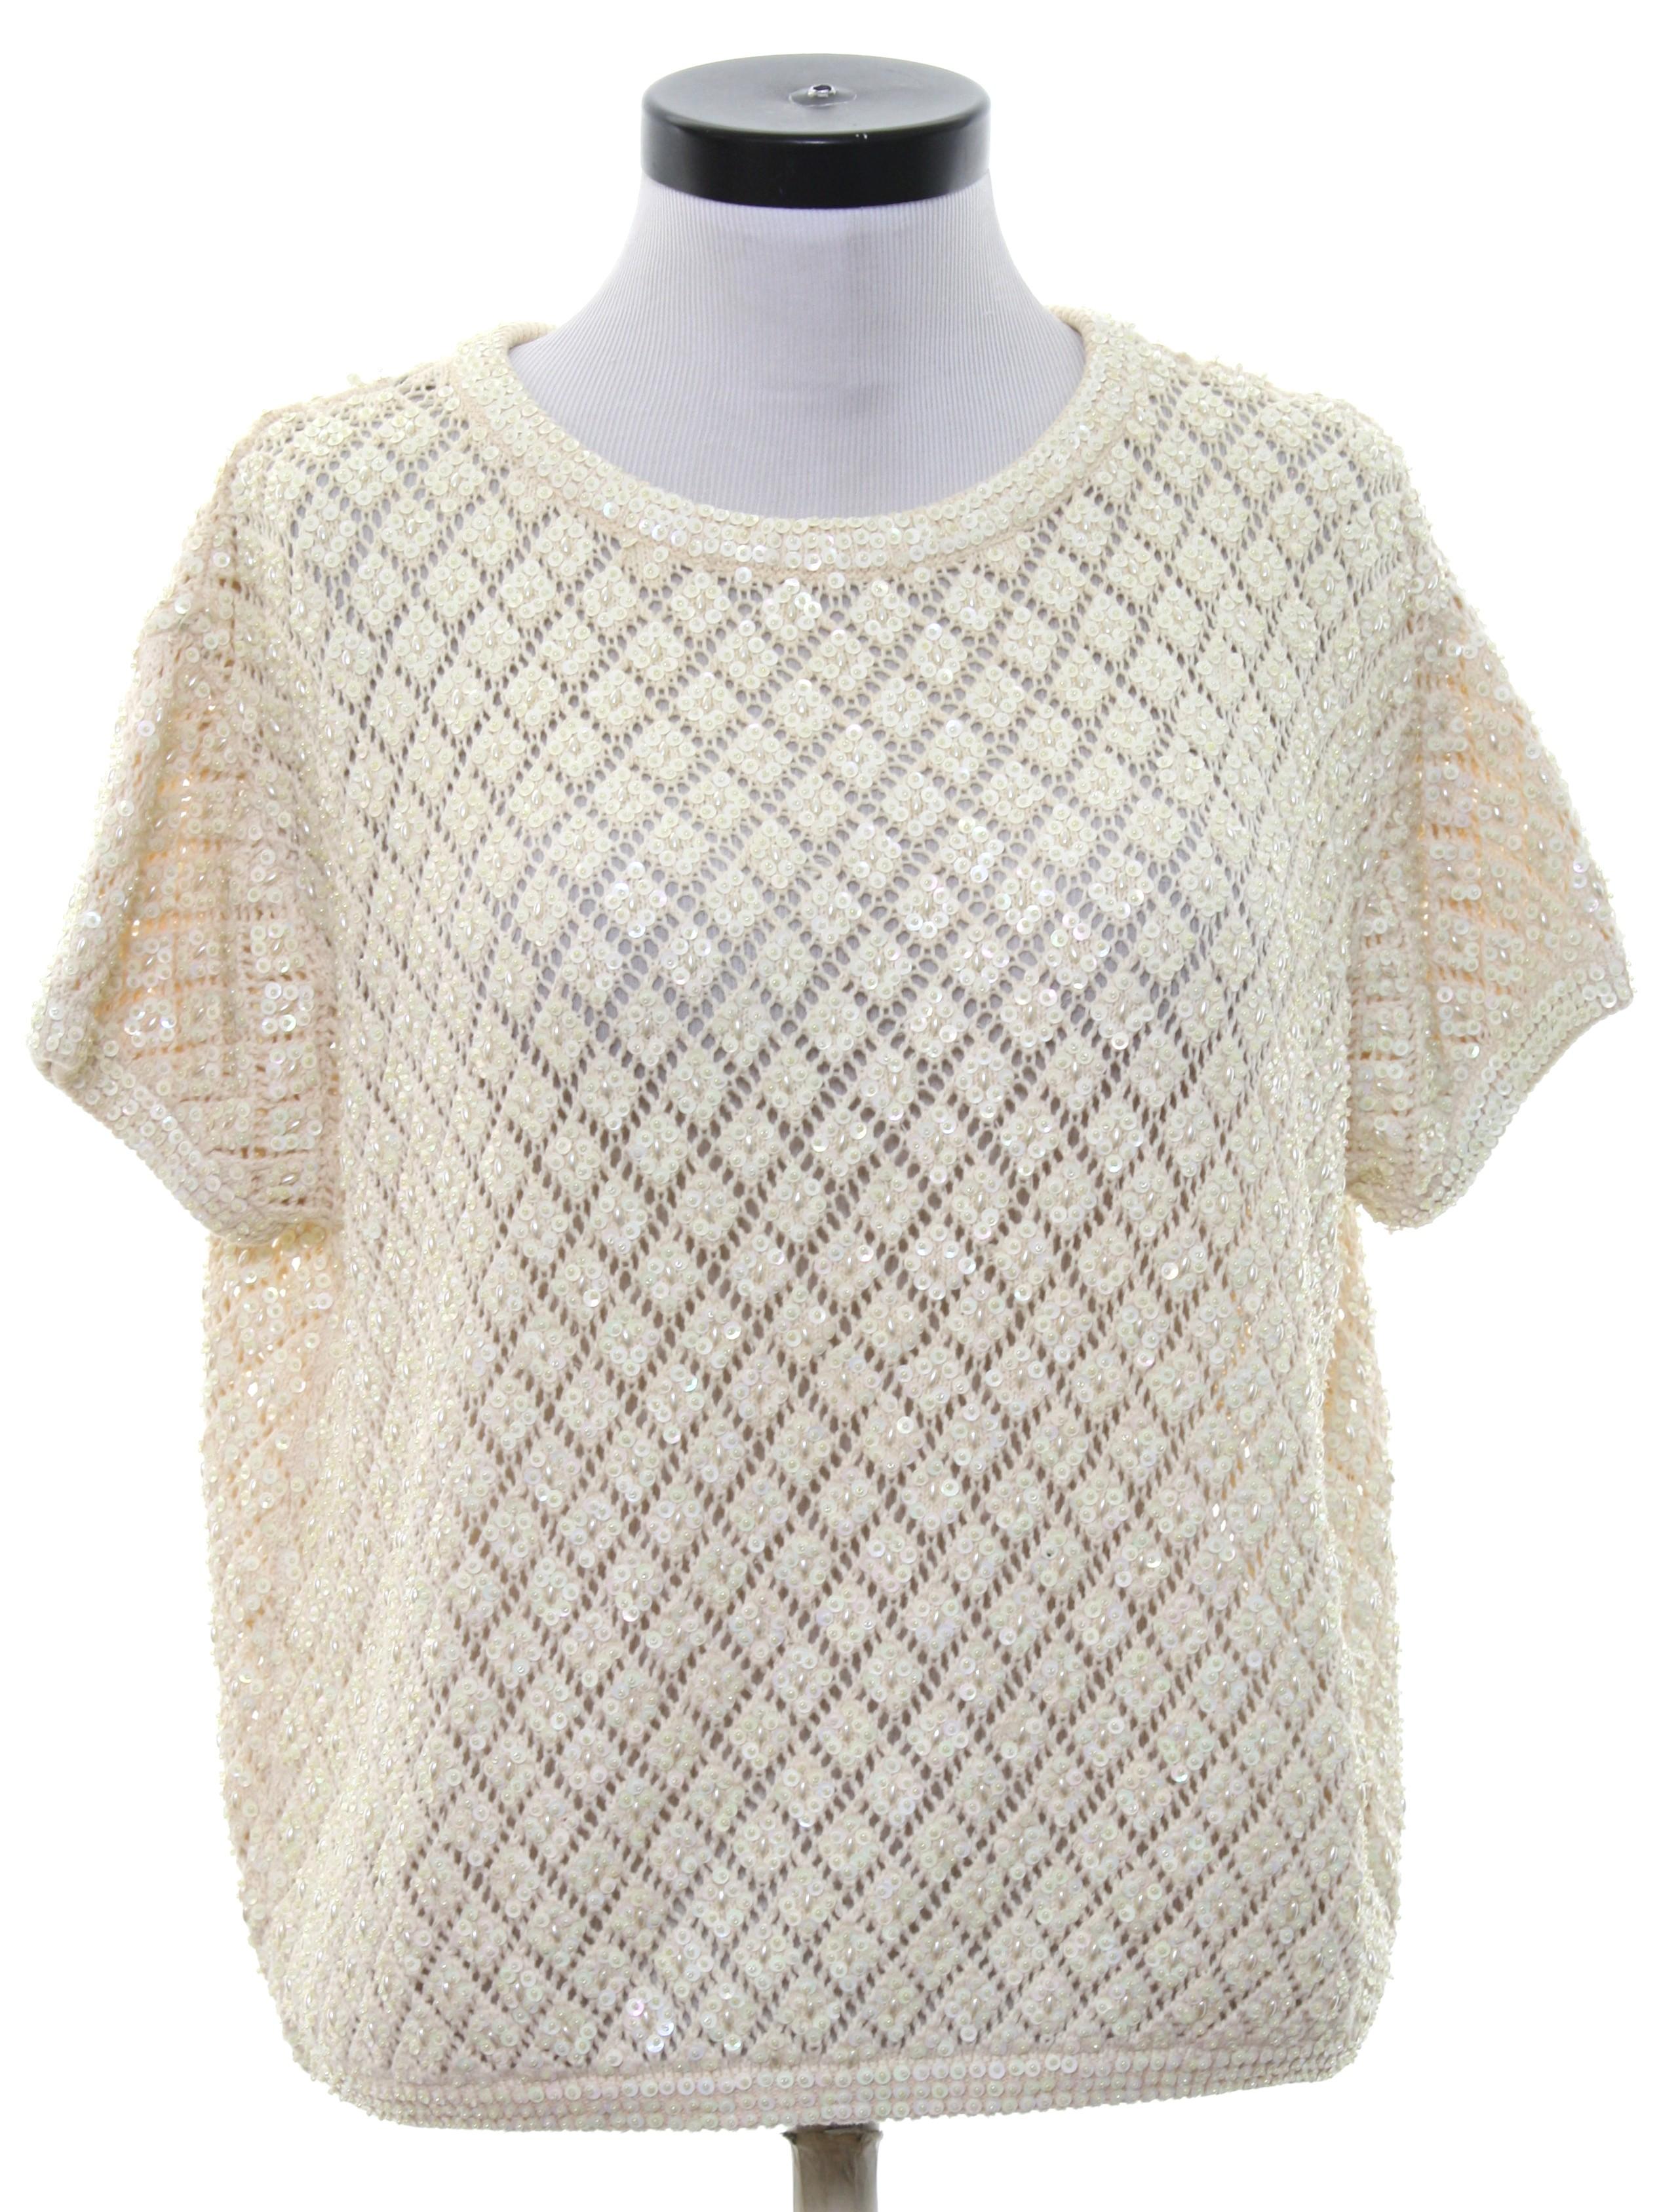 Missing Label Eighties Vintage Beaded Sweater: 80s -Missing Label ...